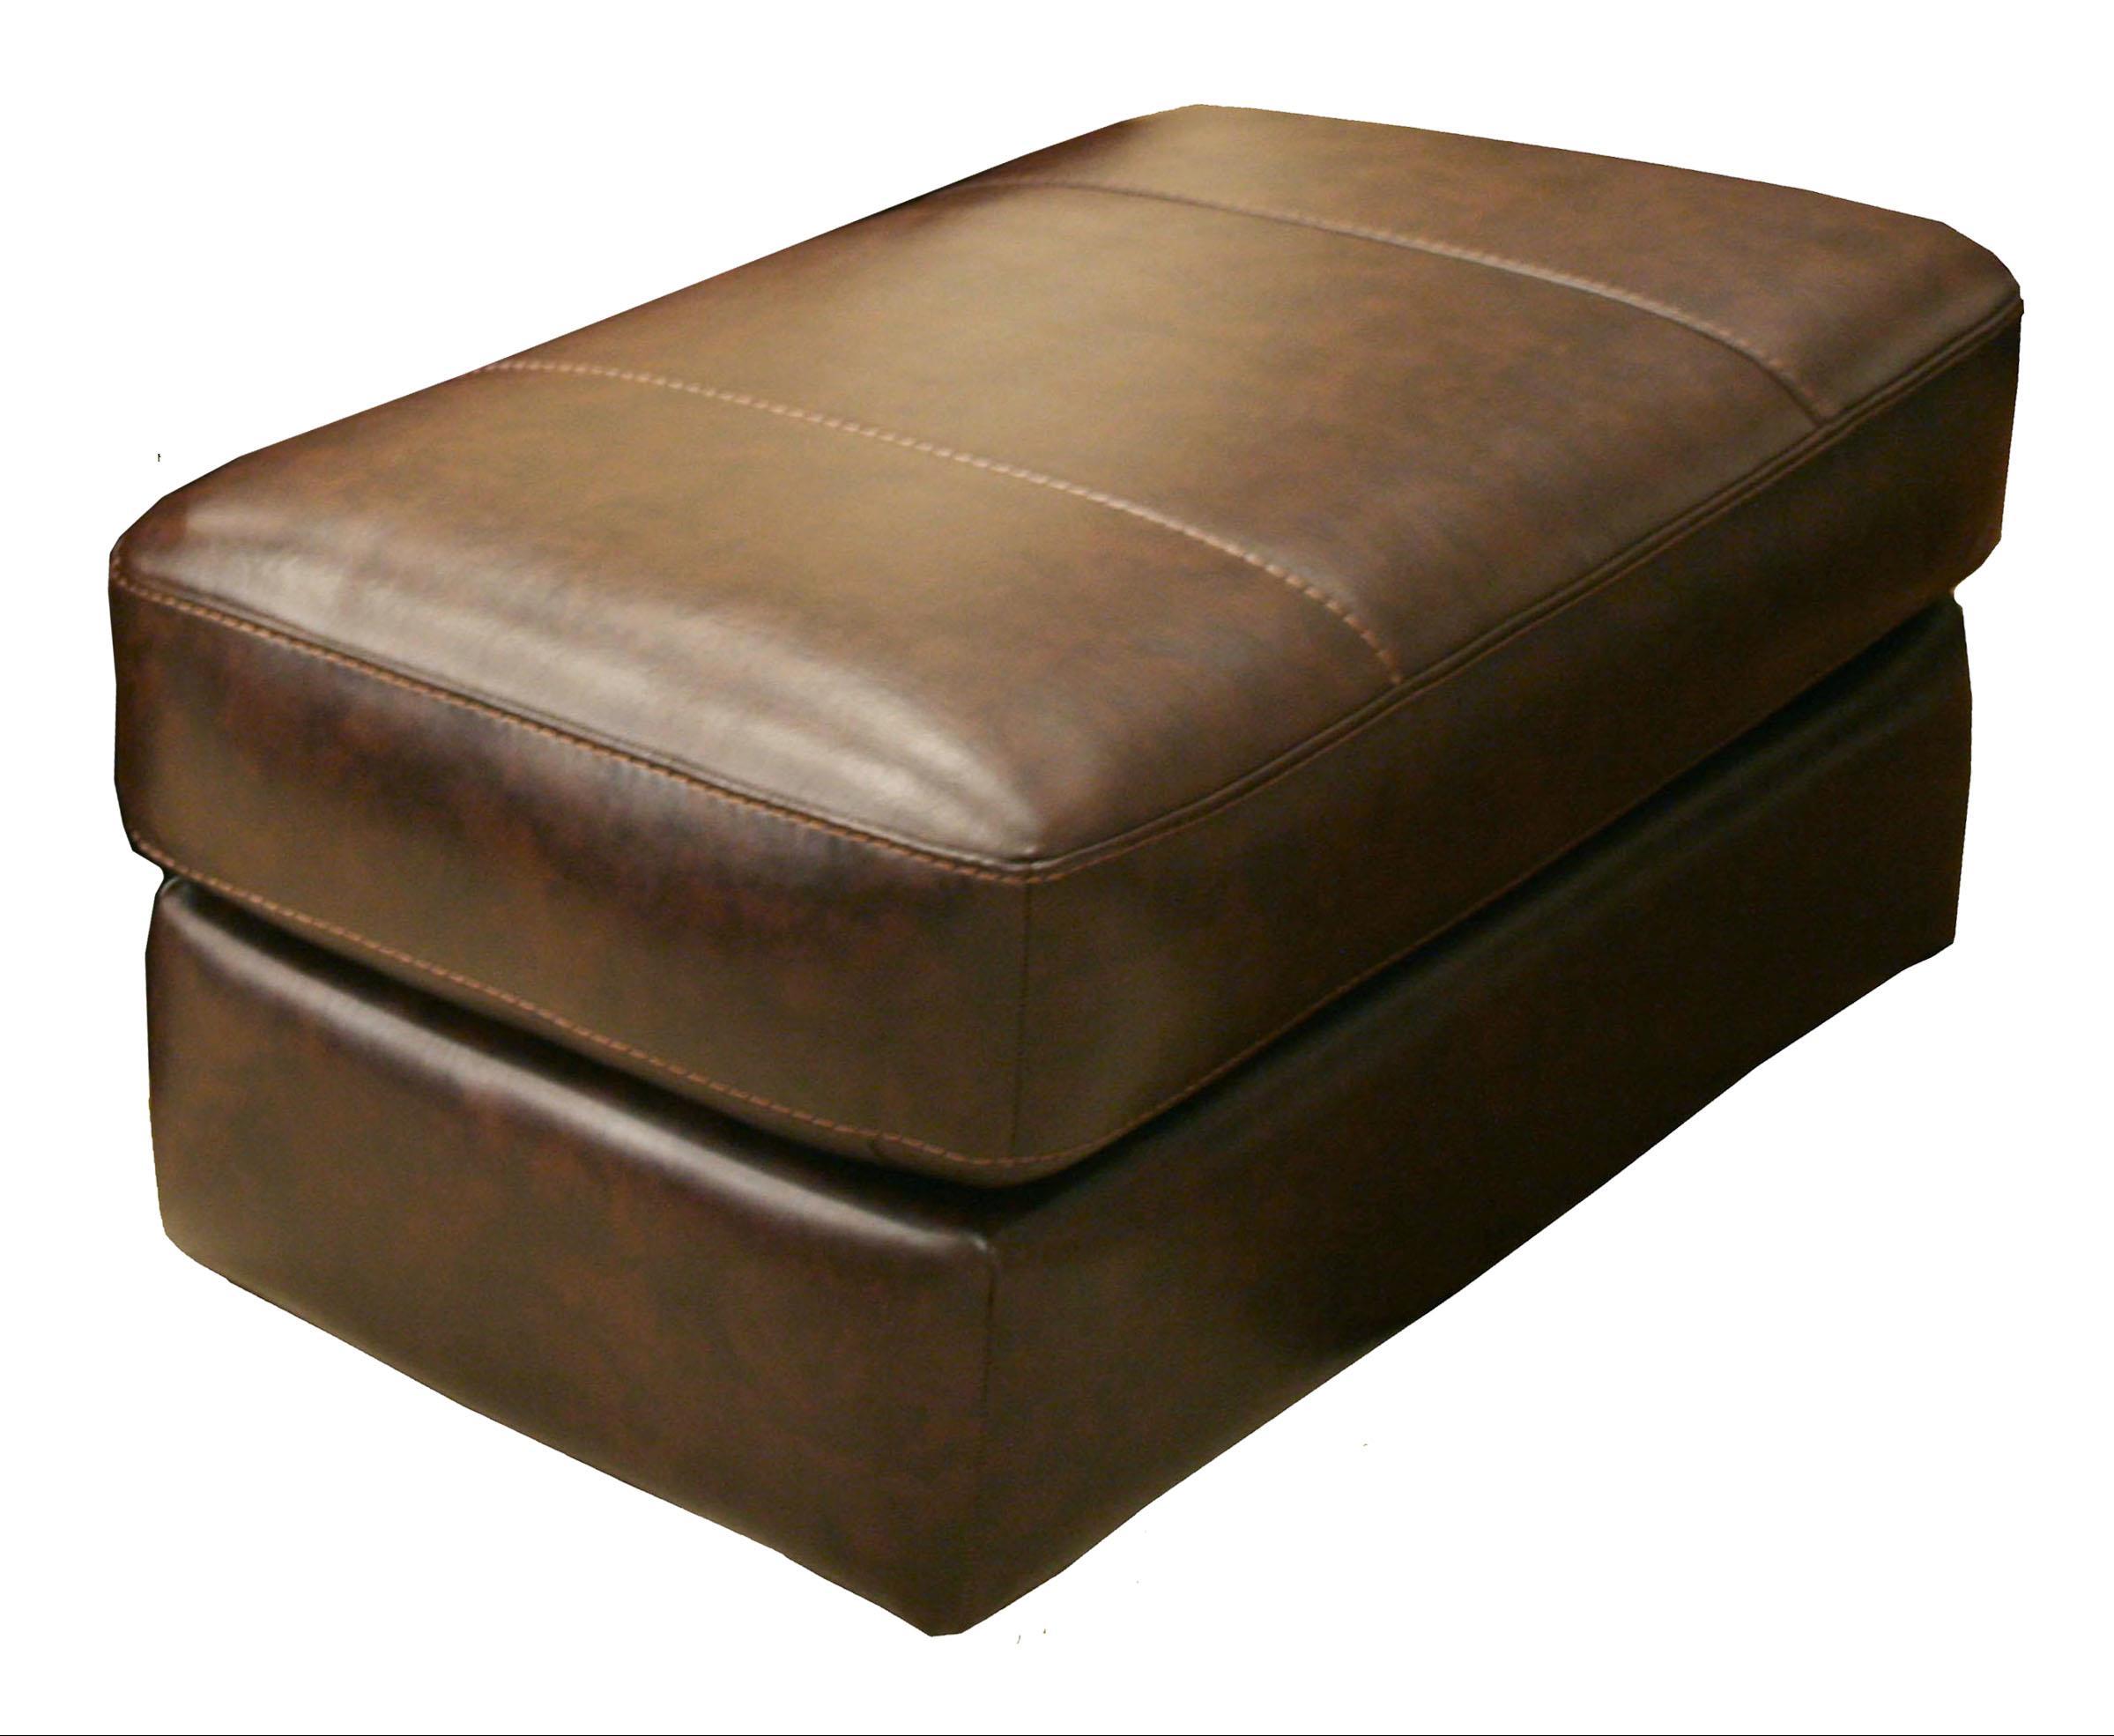 Jackson Furniture Brantley  Ottoman - Item Number: 443010-215-09-3015-09